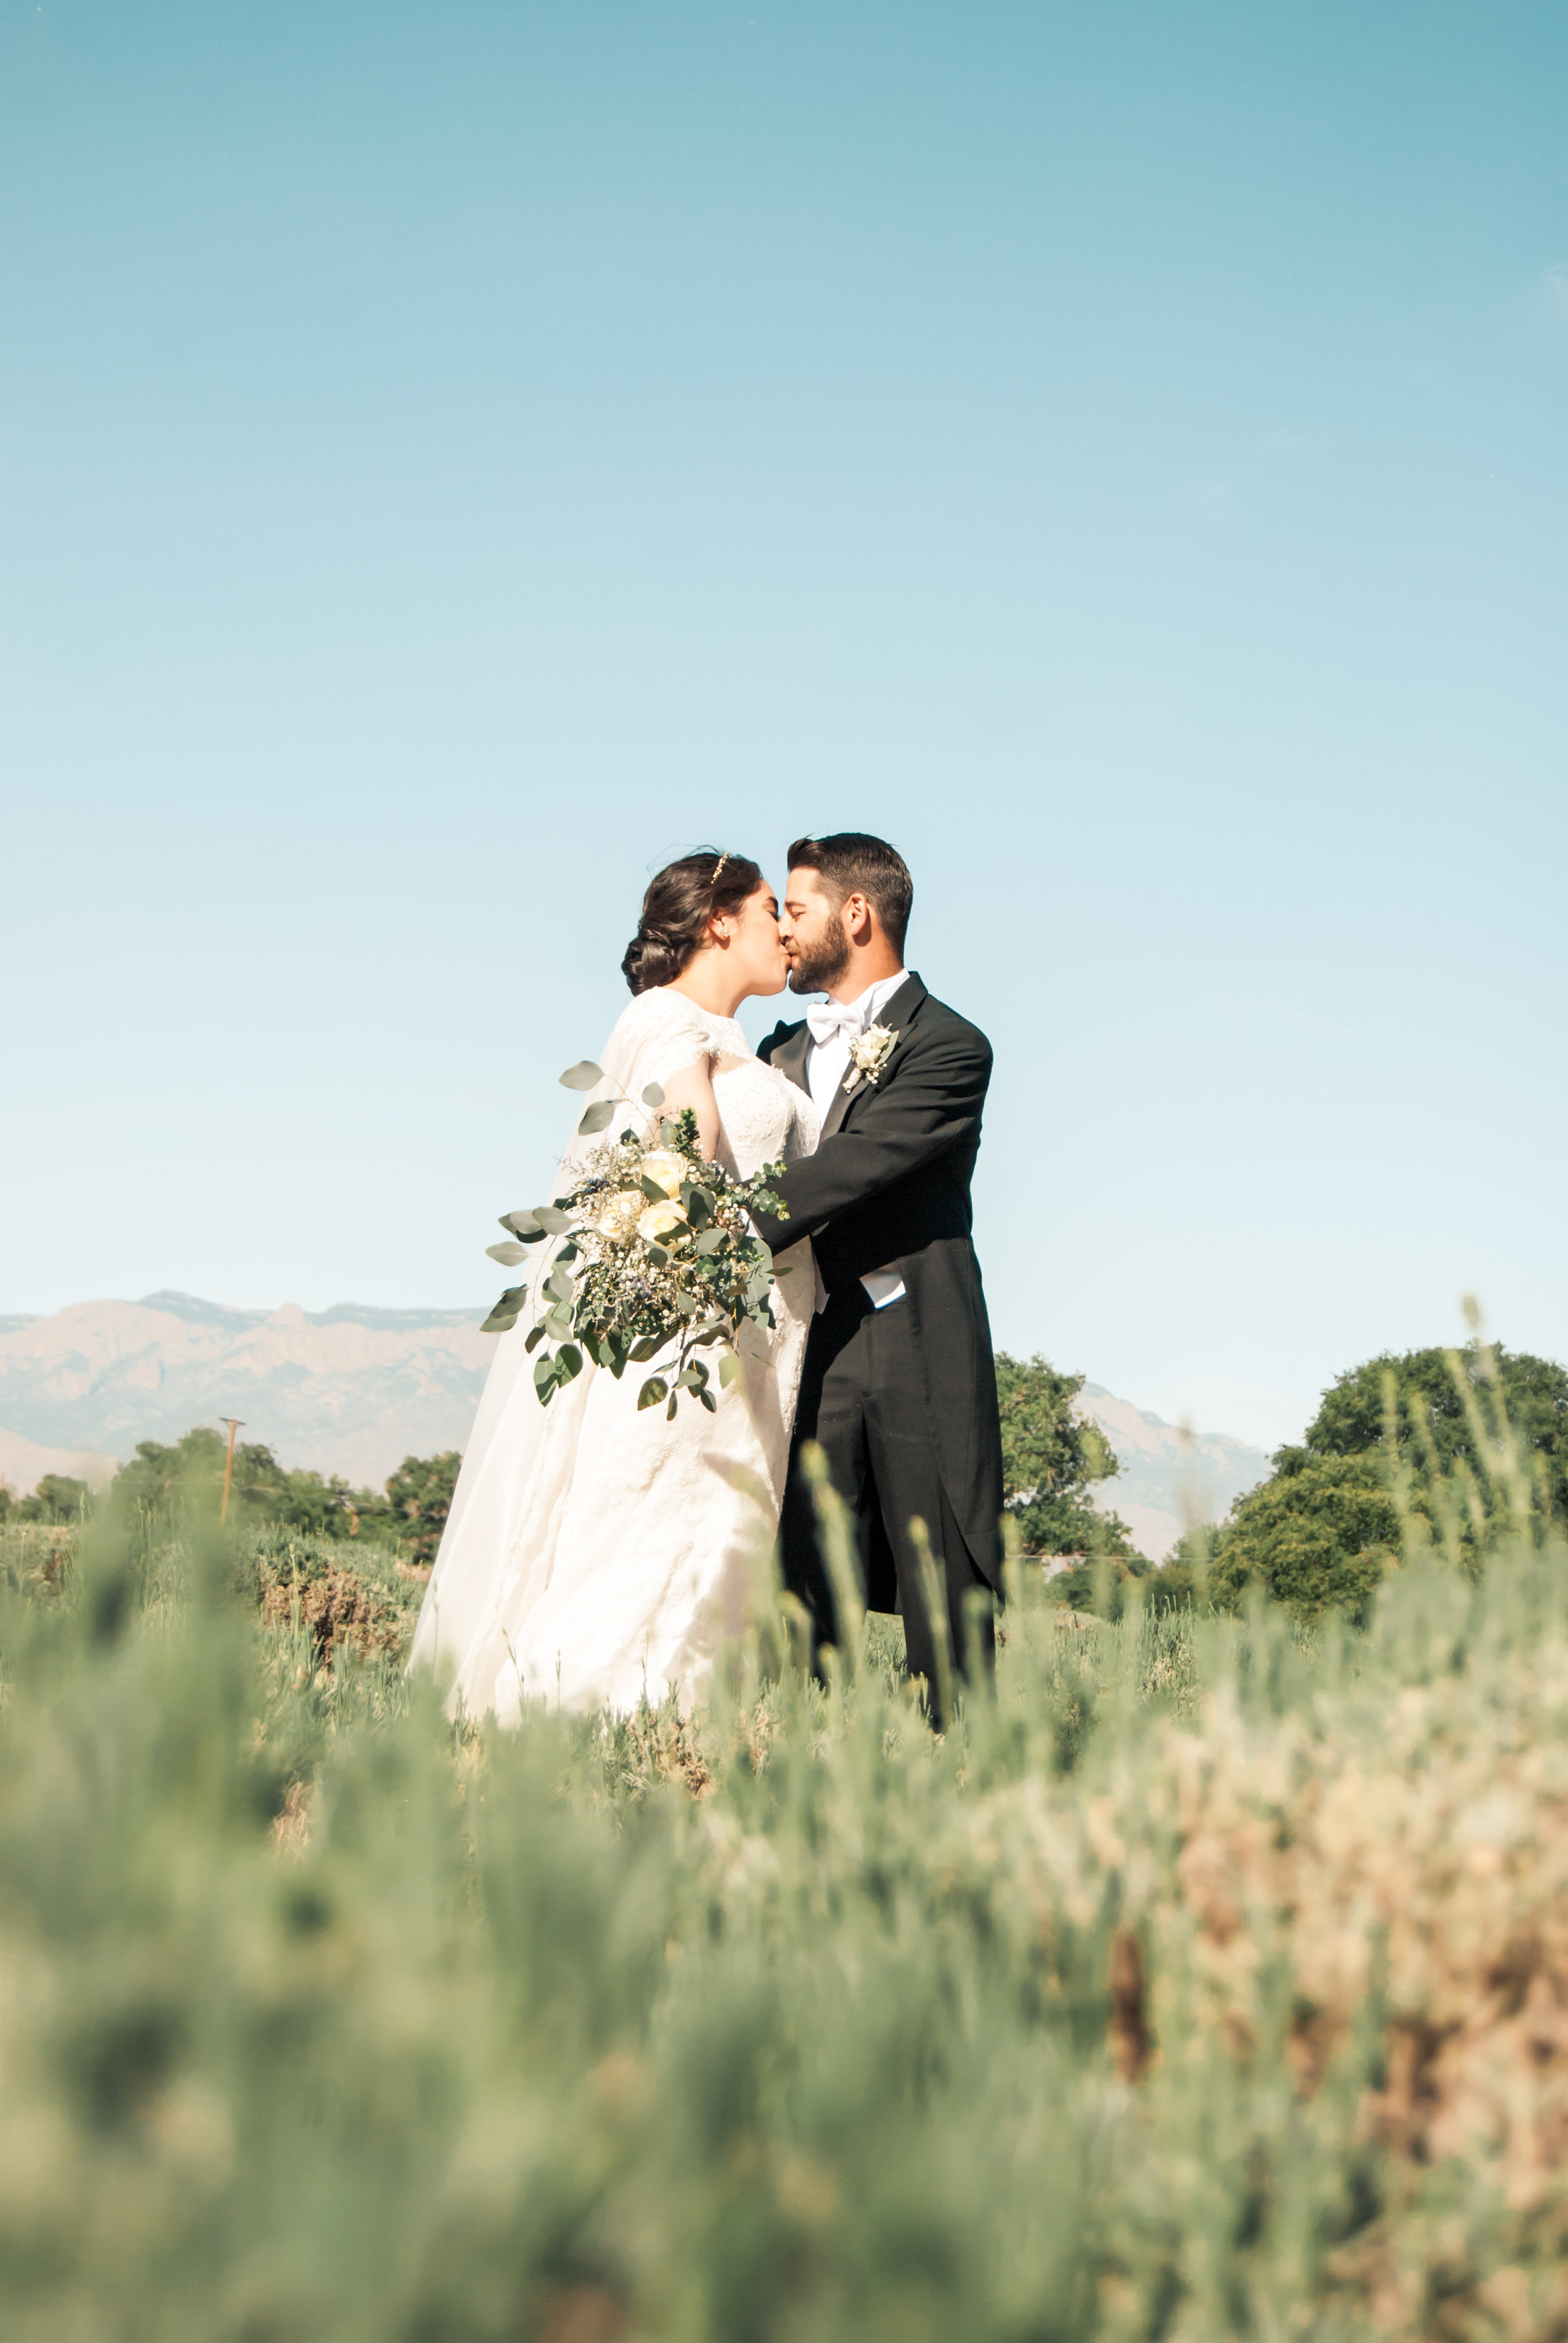 WeddingPortfolio-99.jpg